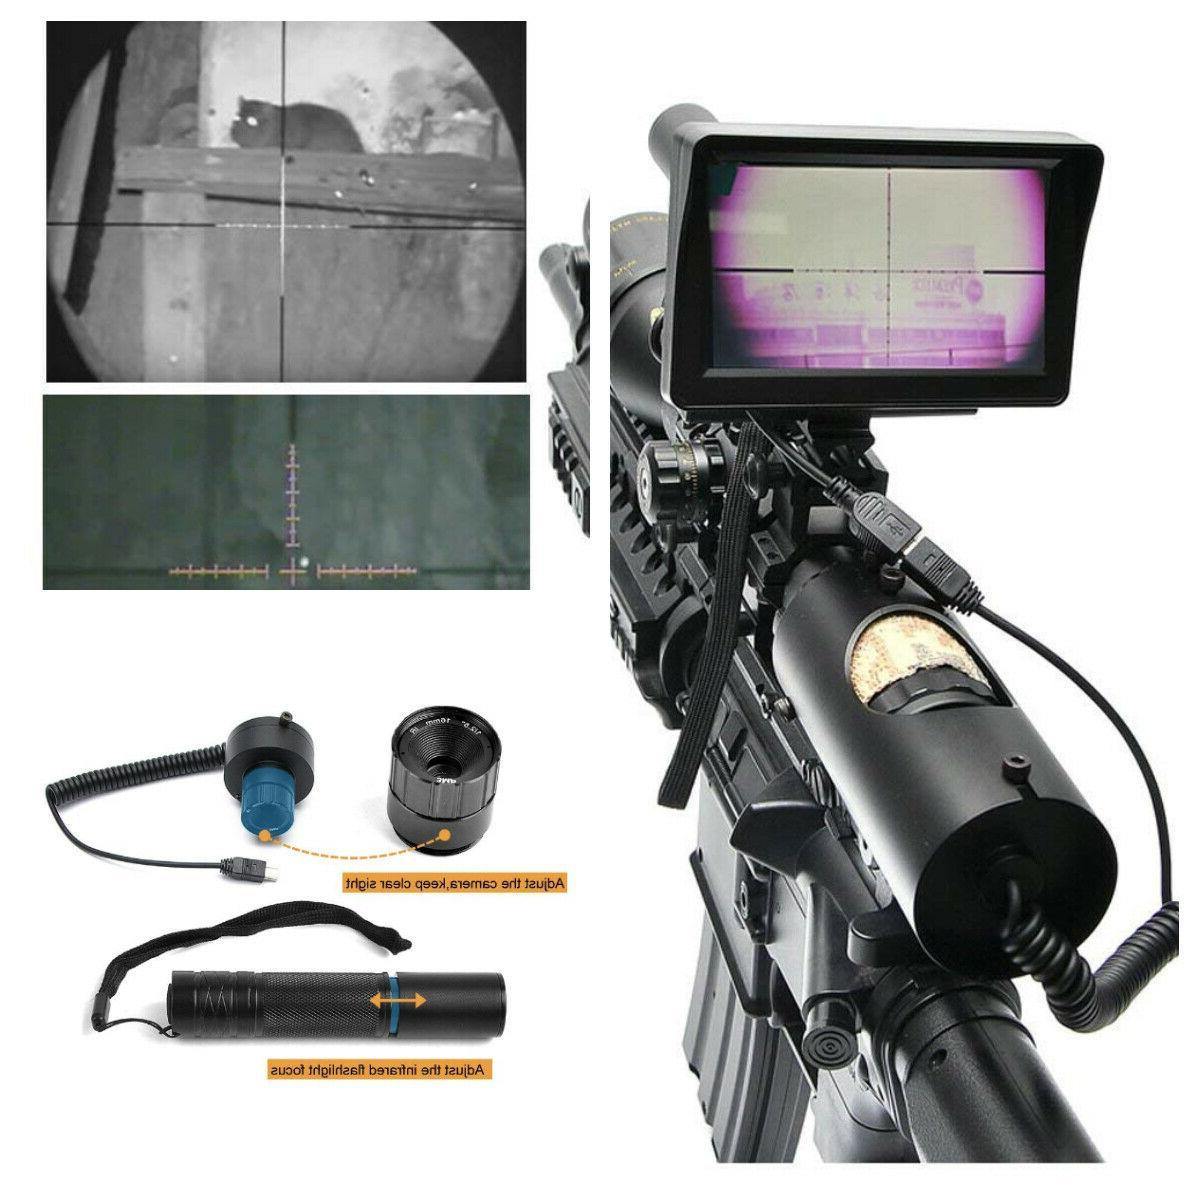 diy digital night vision scope for riflescopes